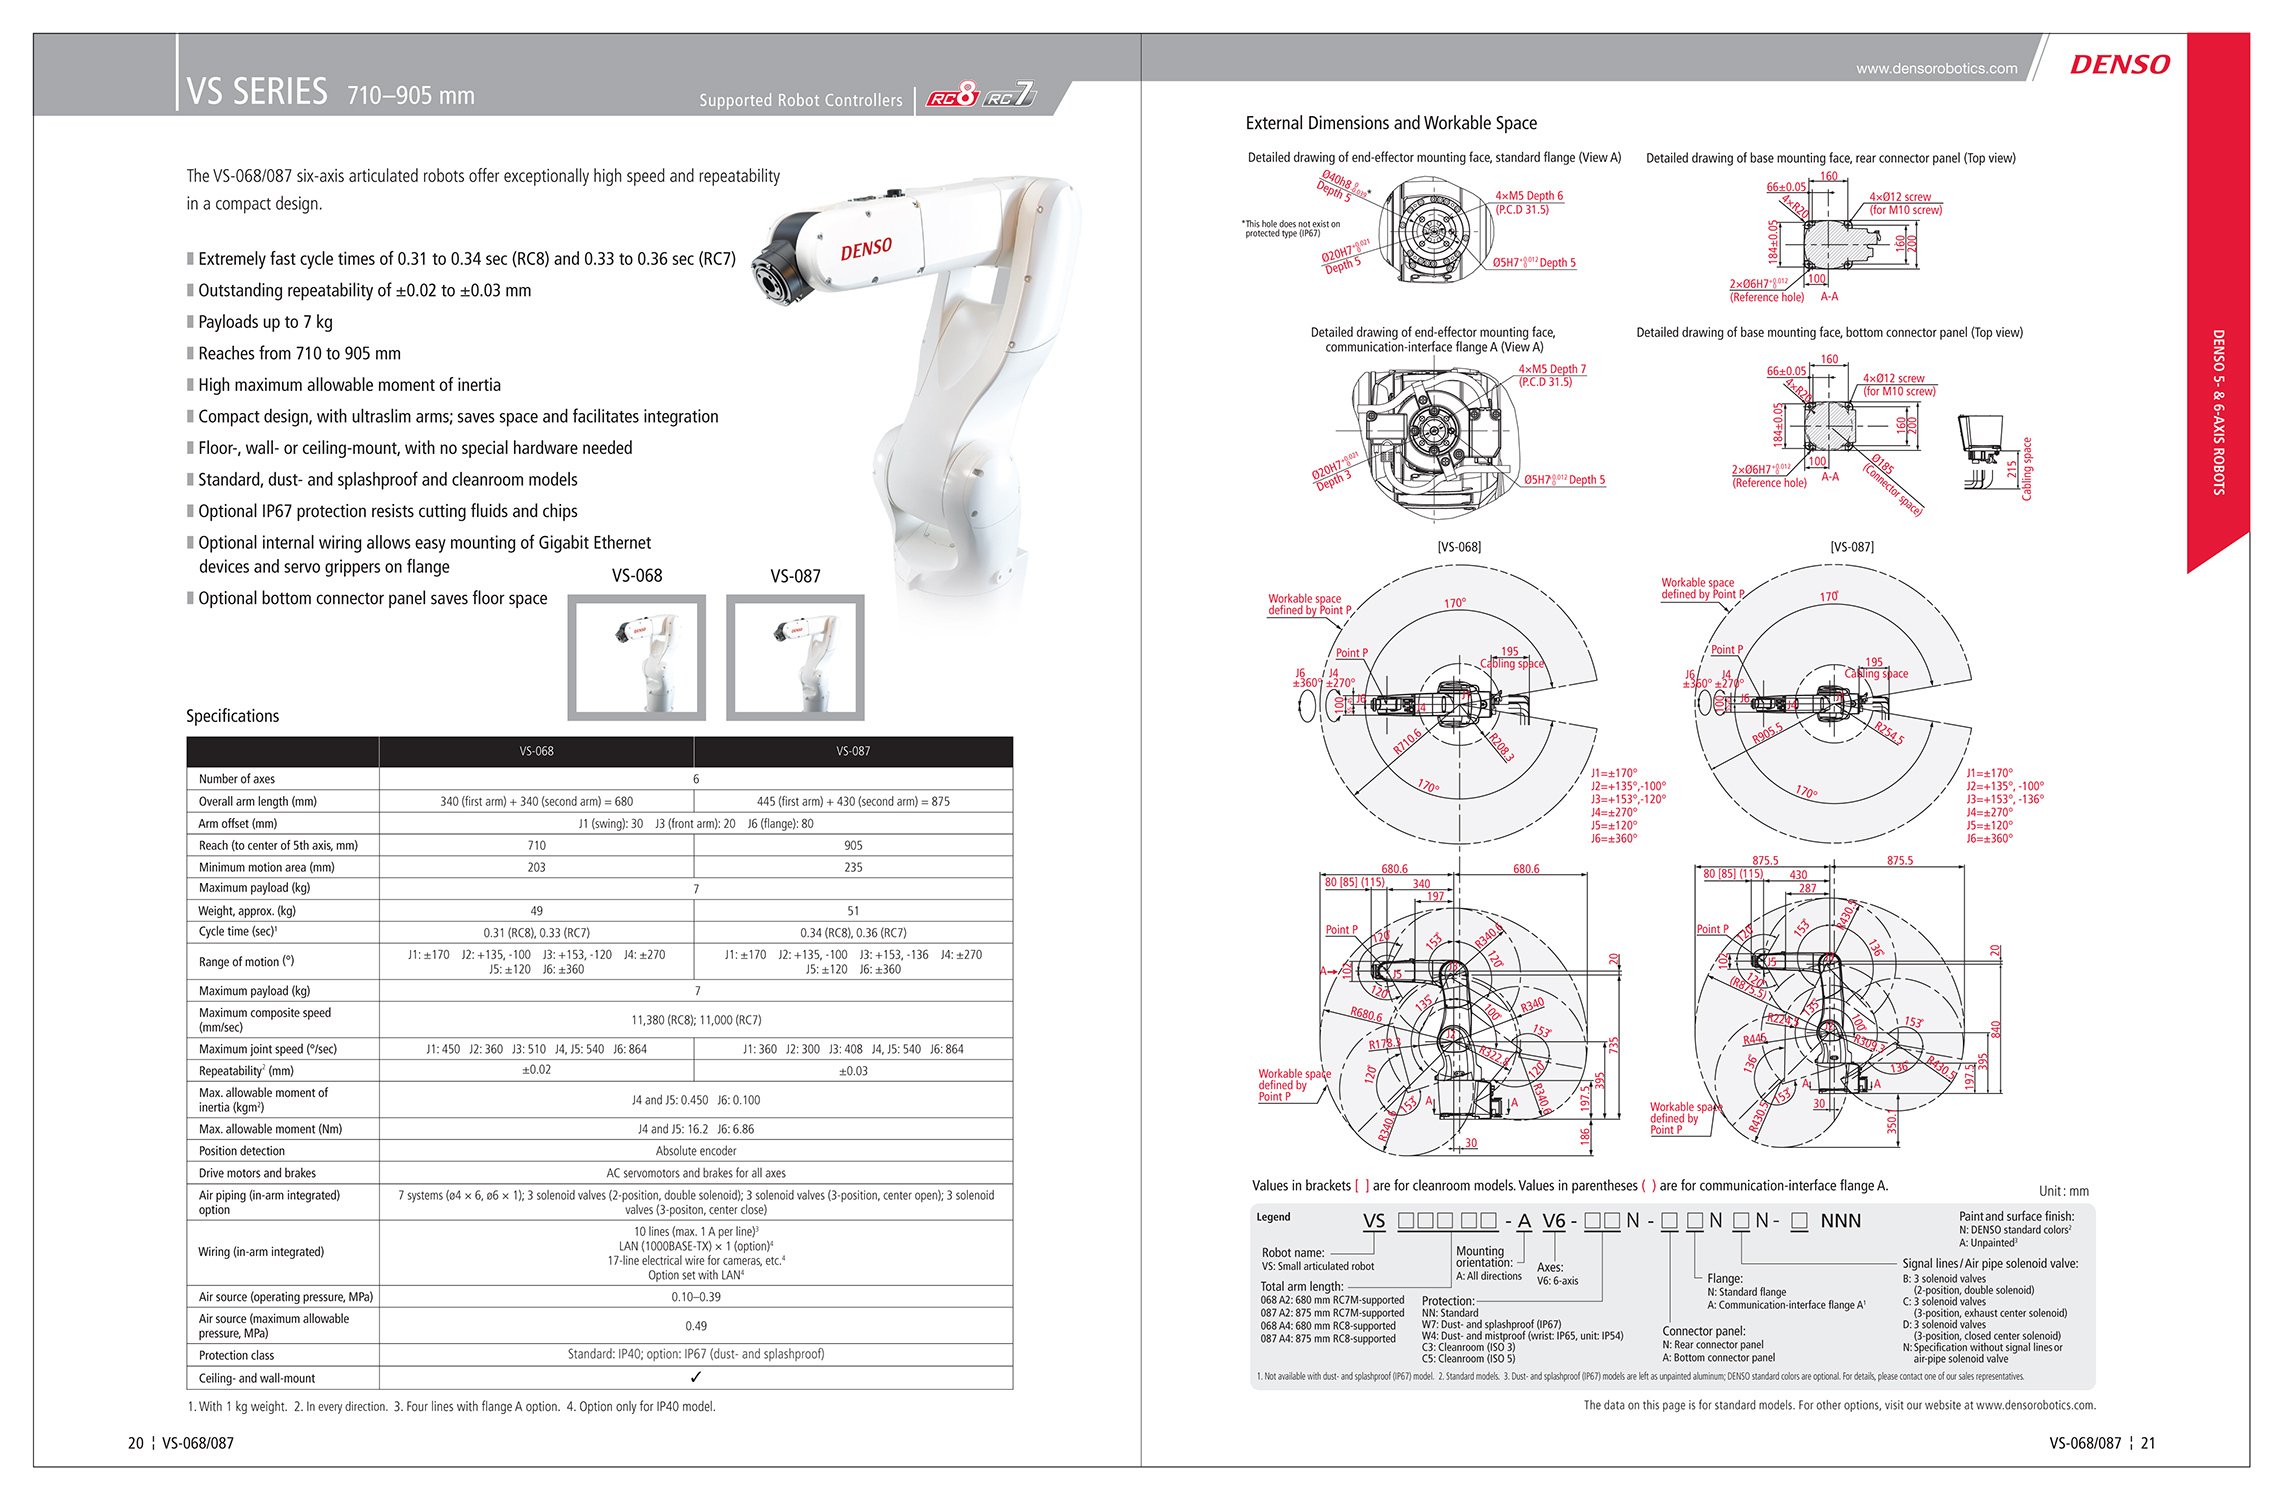 new denso robotics product catalog business wire pioneer wiring diagrams wiring diagram denso robot [ 2283 x 1500 Pixel ]